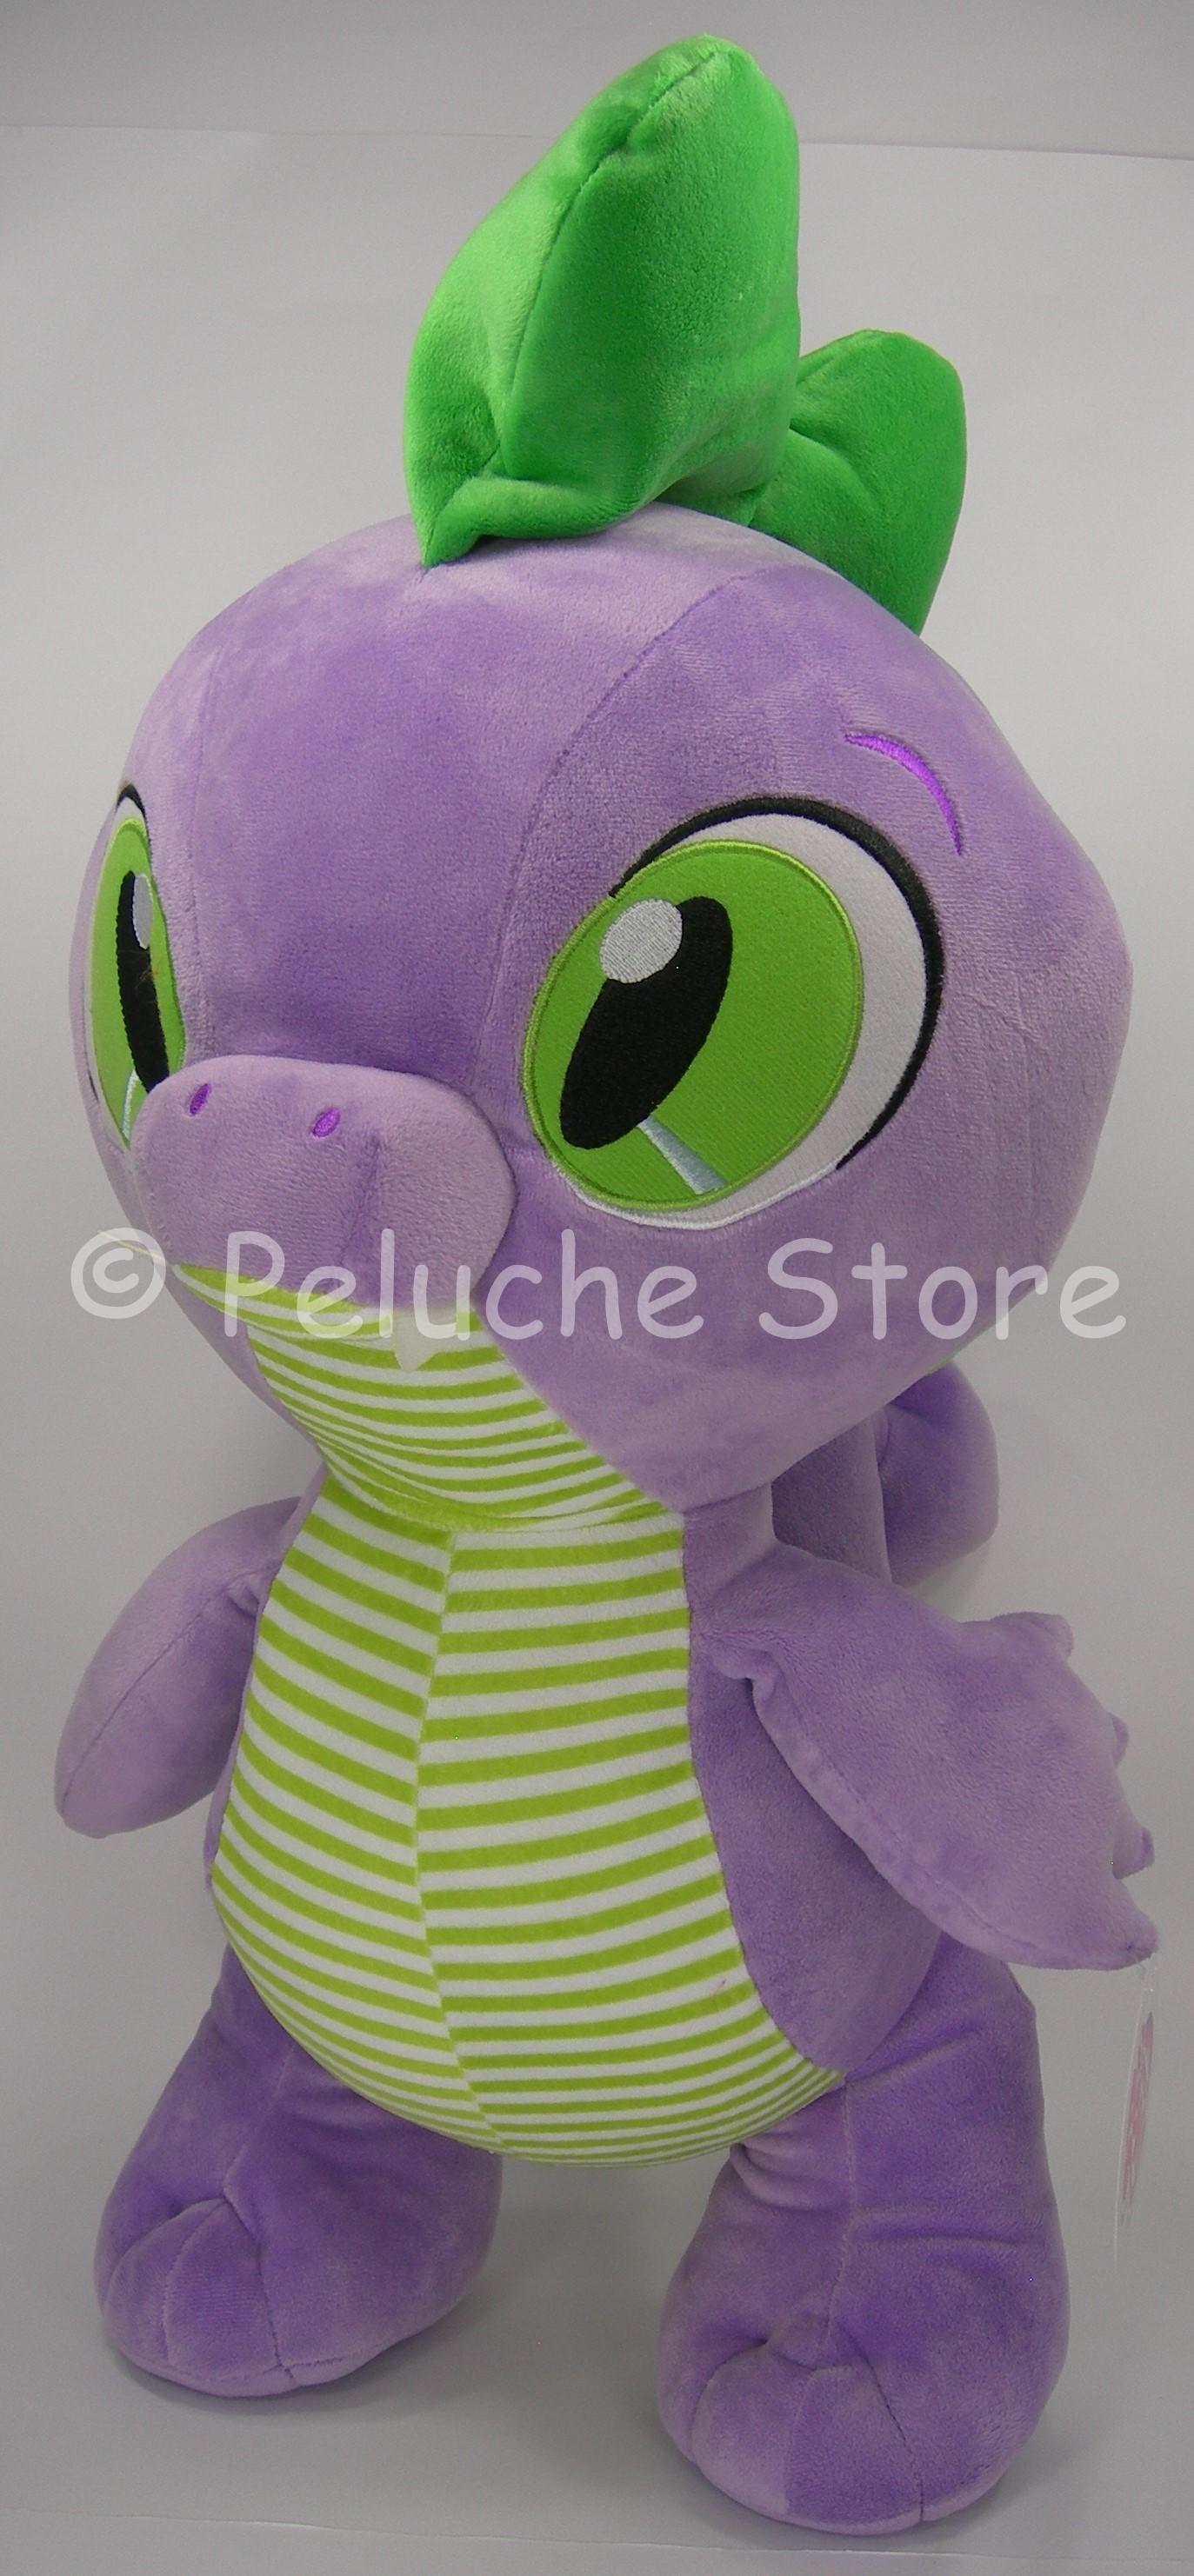 My Little Pony Peluche Gigante 60 cm Qualità Velluto Originale